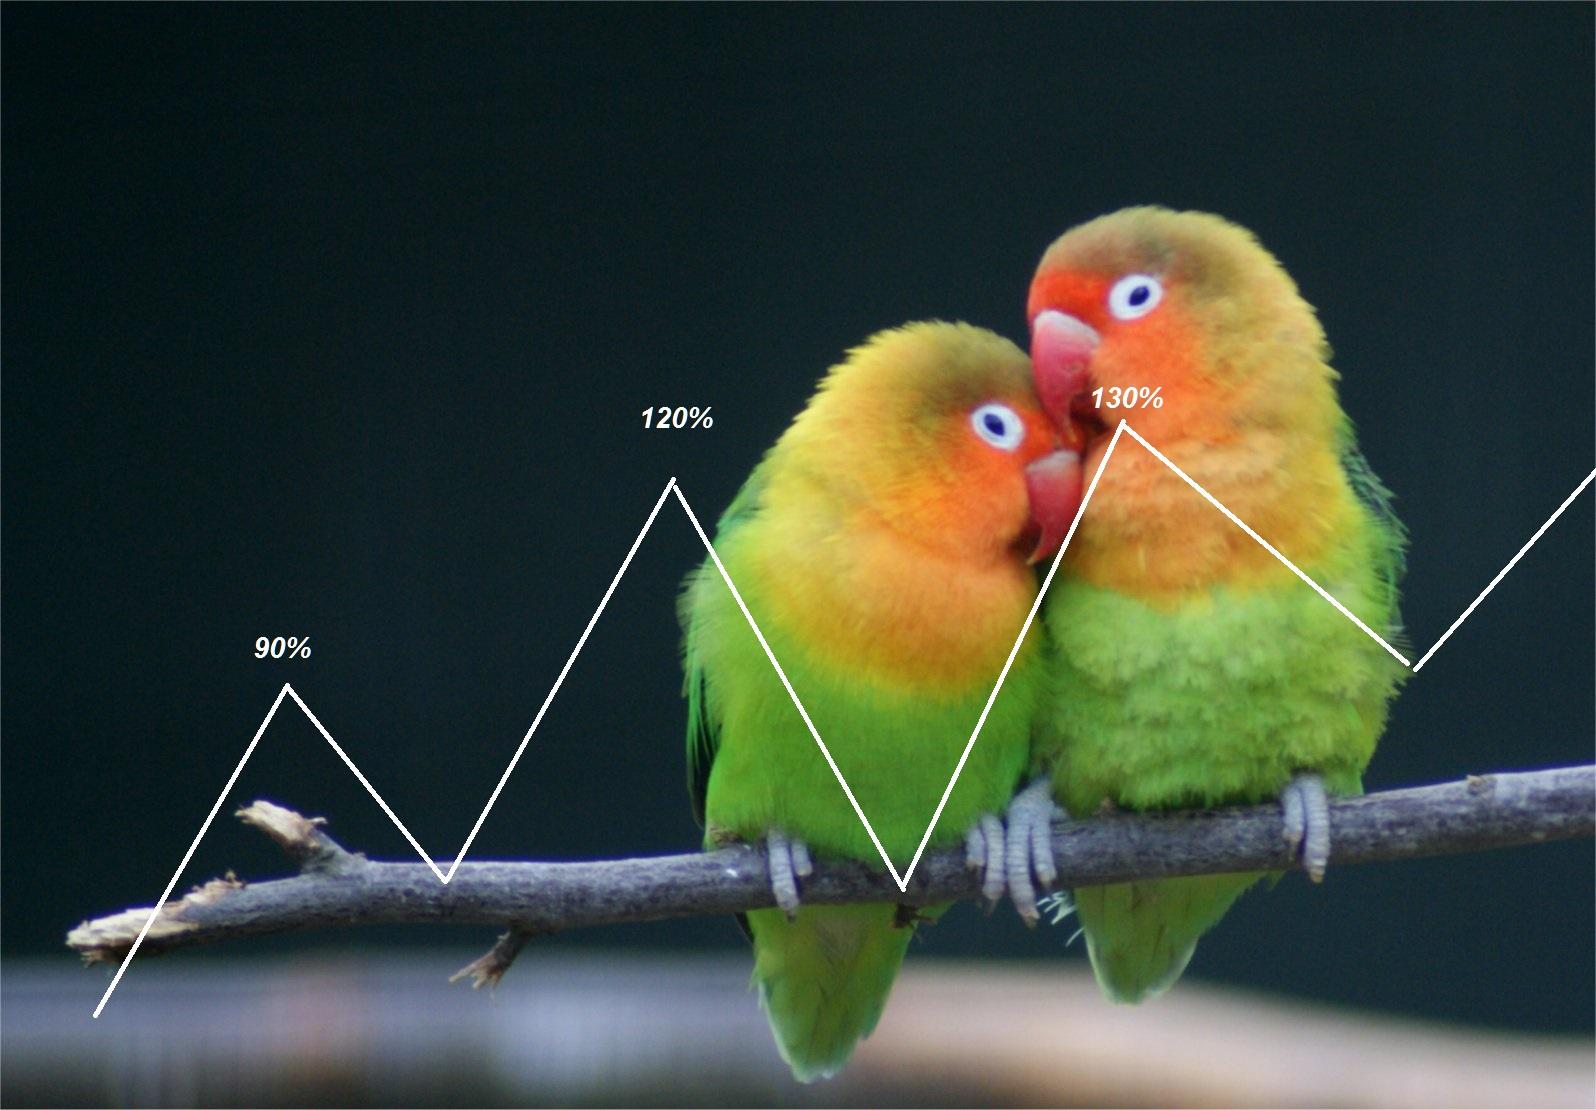 harga burung 2015 harga burung 2015 92 harga burung di